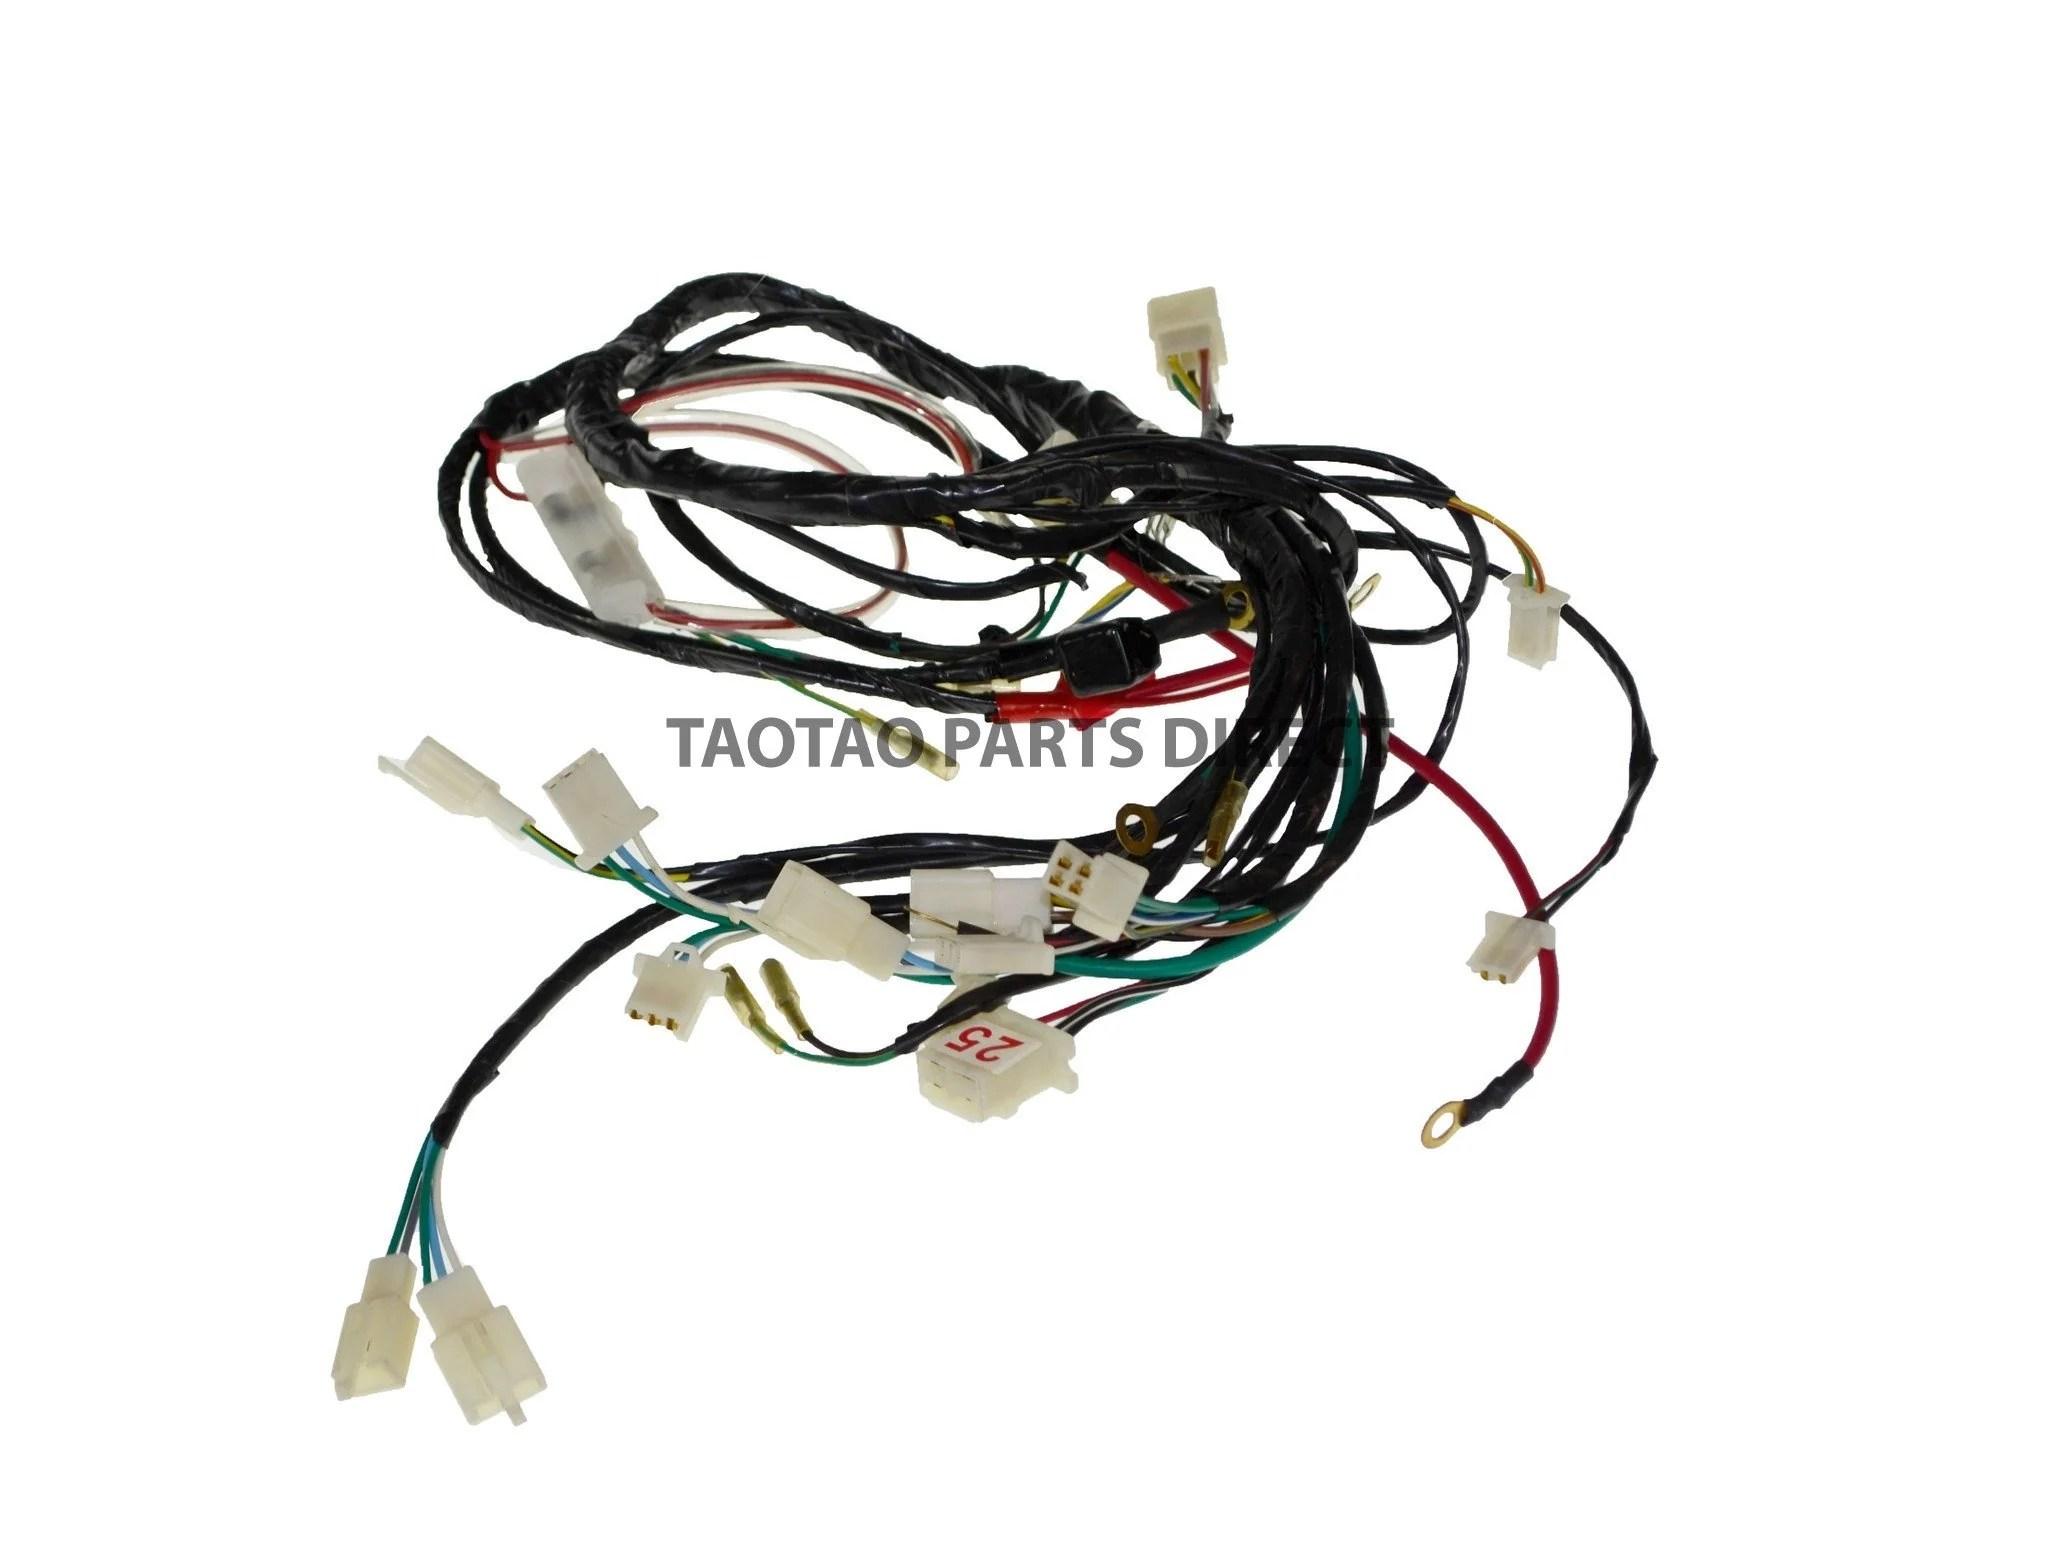 medium resolution of atv parts ata250d wire harness 25